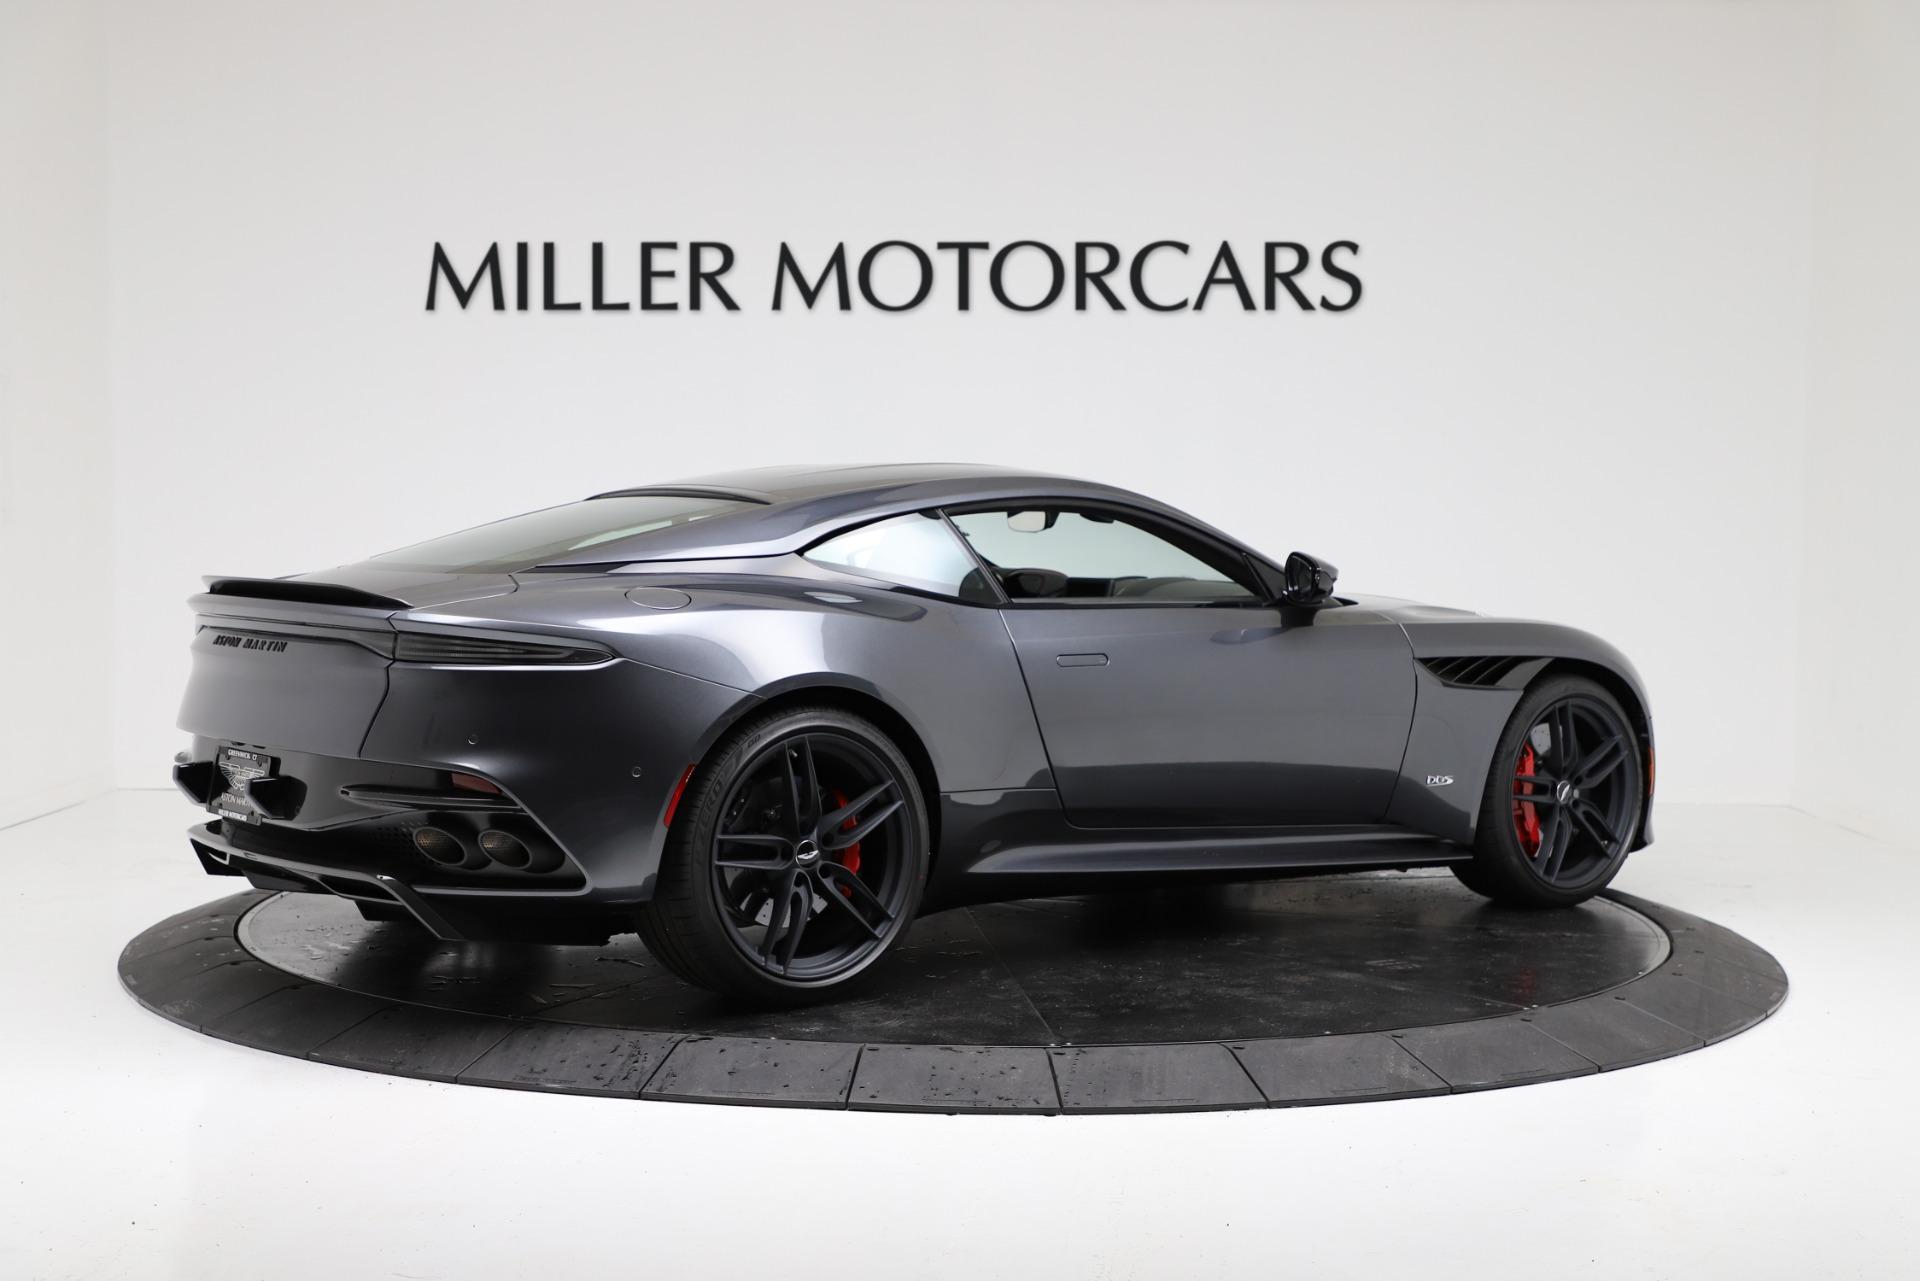 New 2019 Aston Martin DBS Superleggera For Sale In Westport, CT 3318_p7